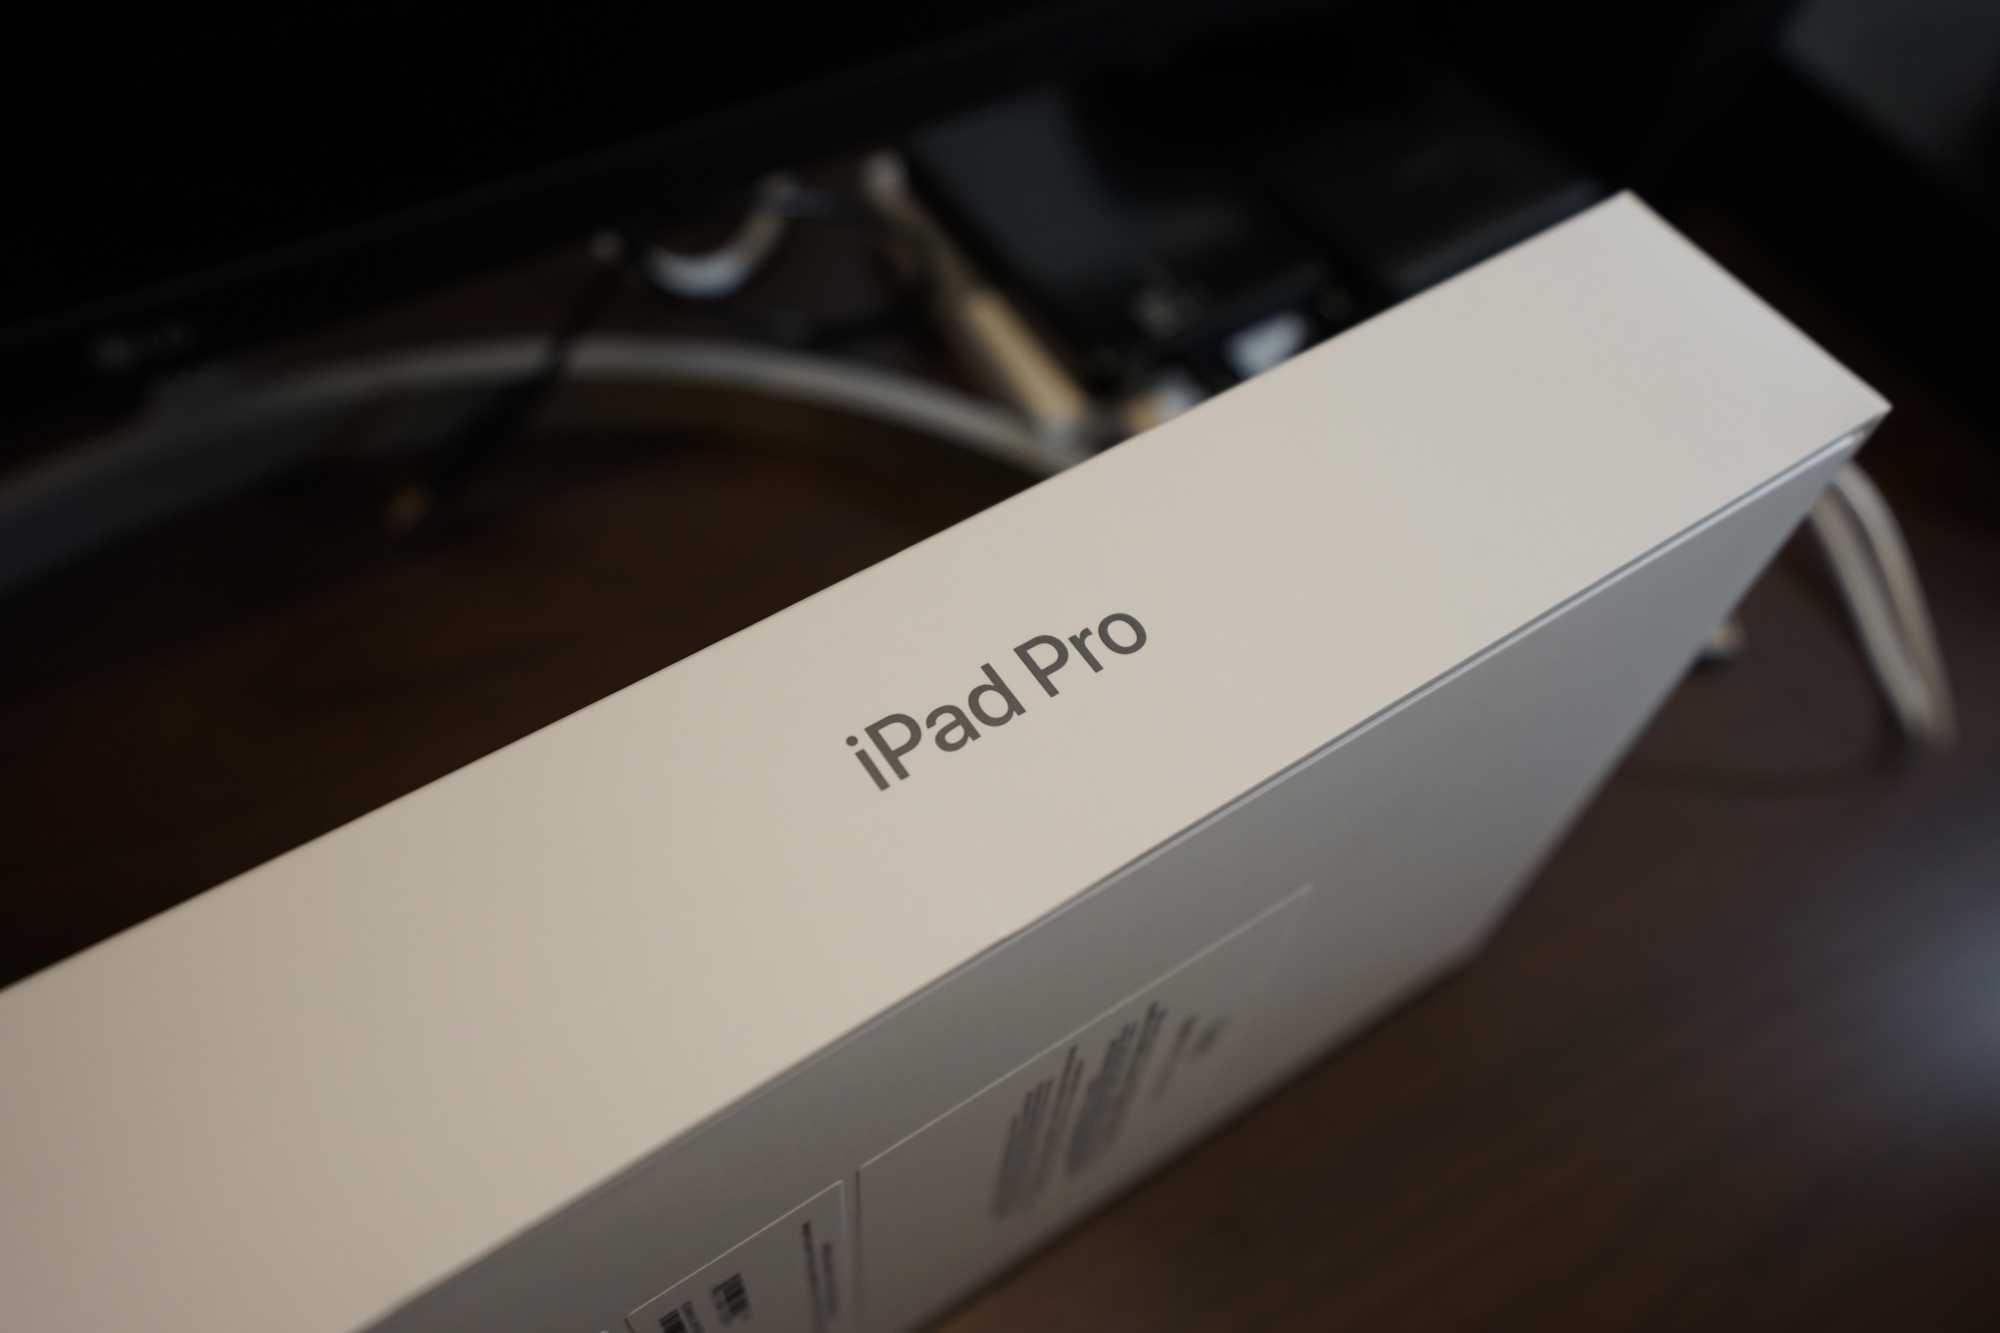 iPad Pro 11-inch Box